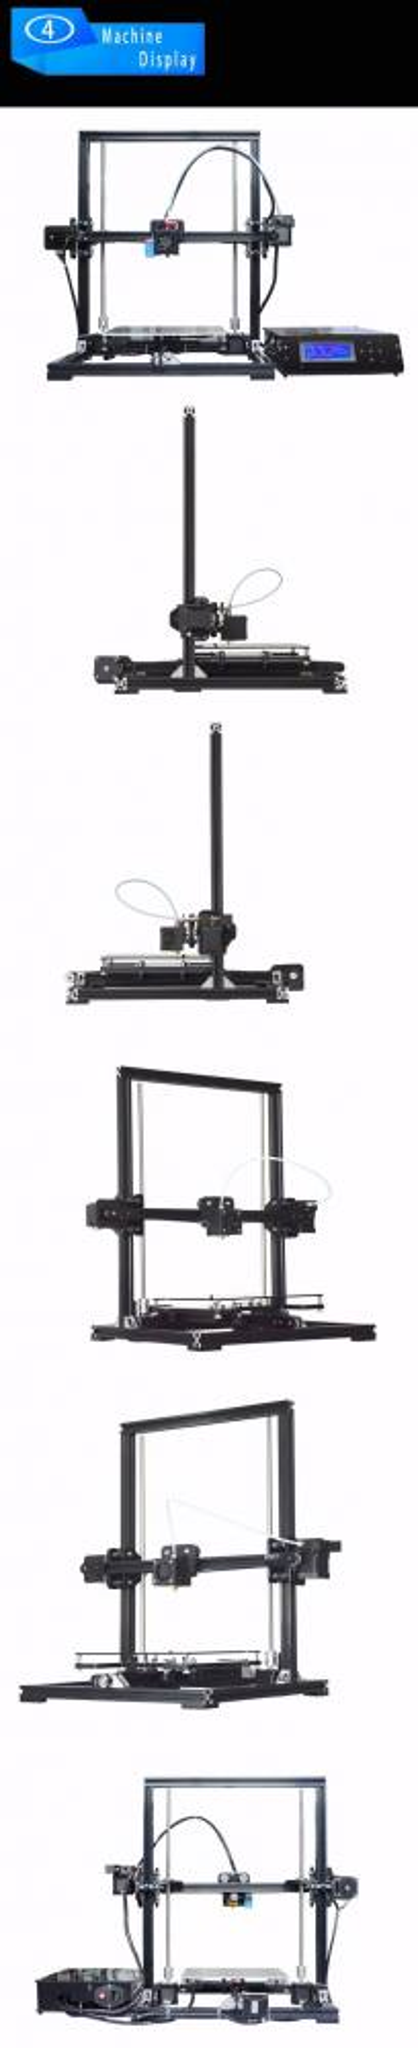 best quality 3d printer